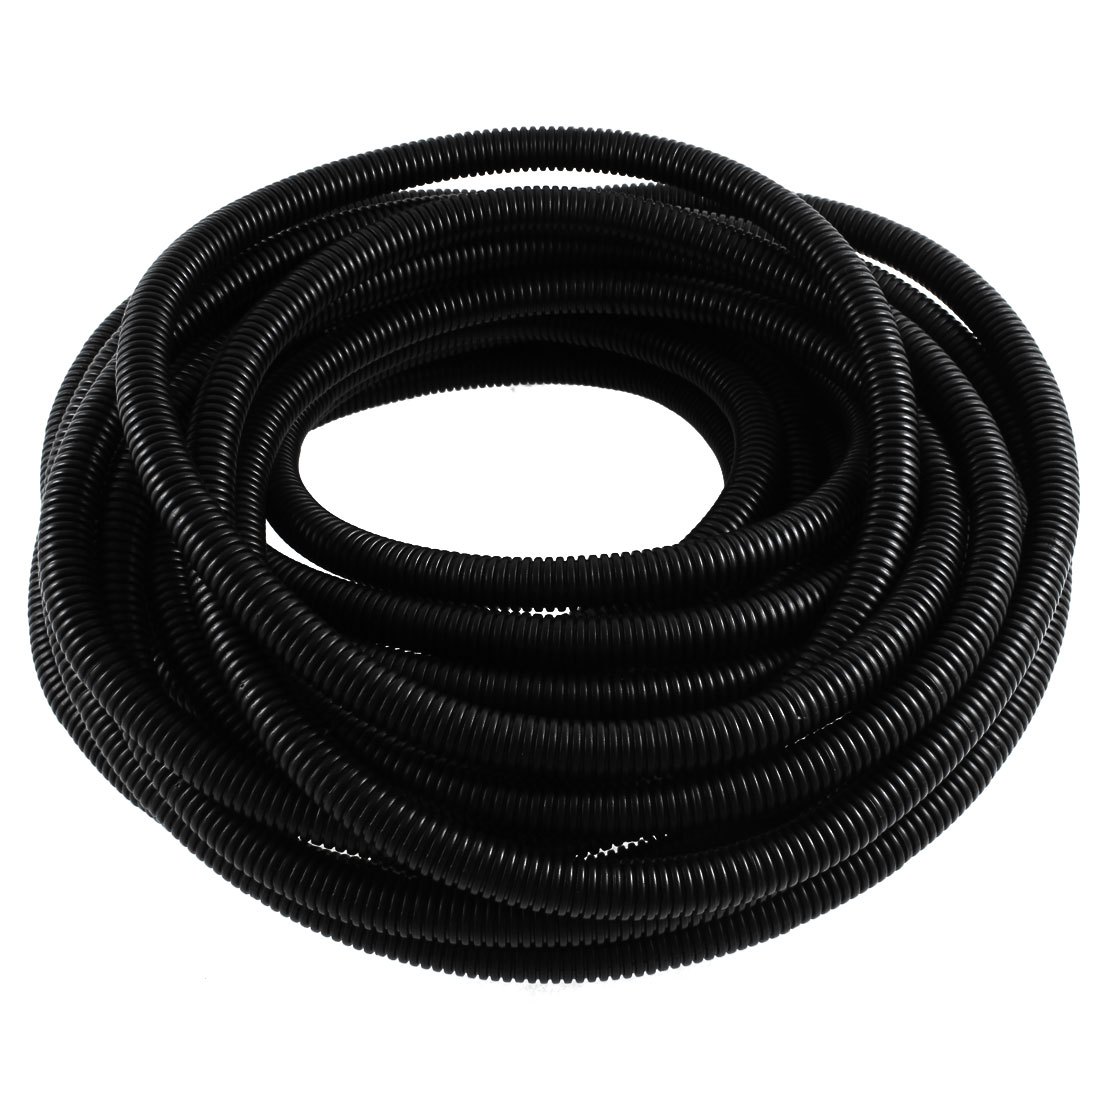 Flexible PVC 13mm Outer Dia Corrugated Tubing Conduit Tube Pipe 12M 39ft Long